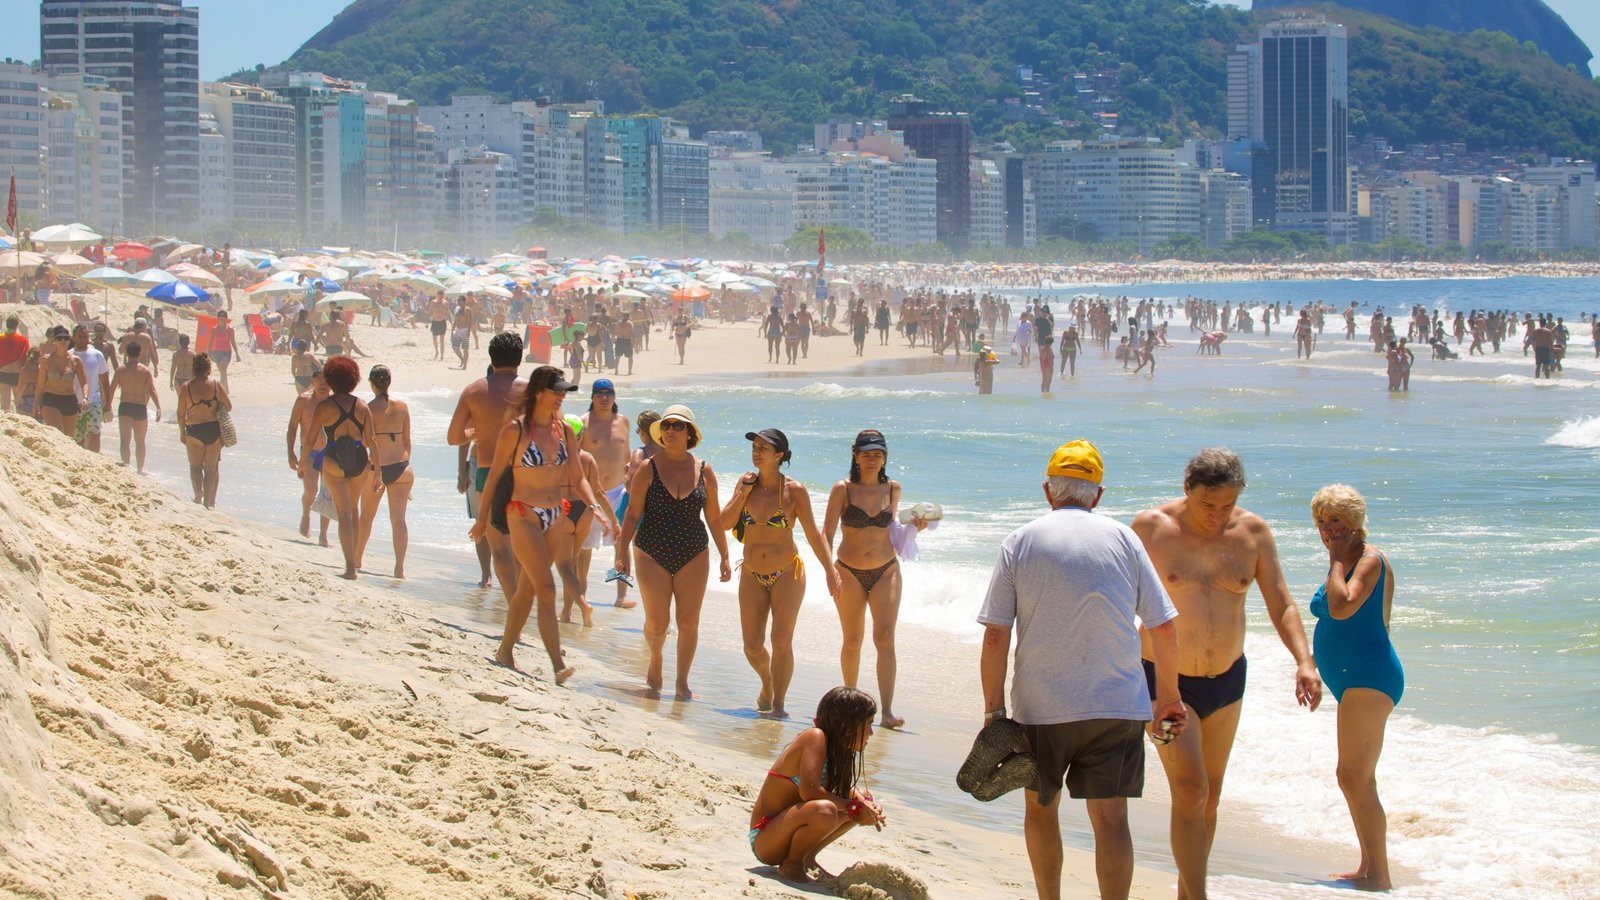 Copacabana beach topless